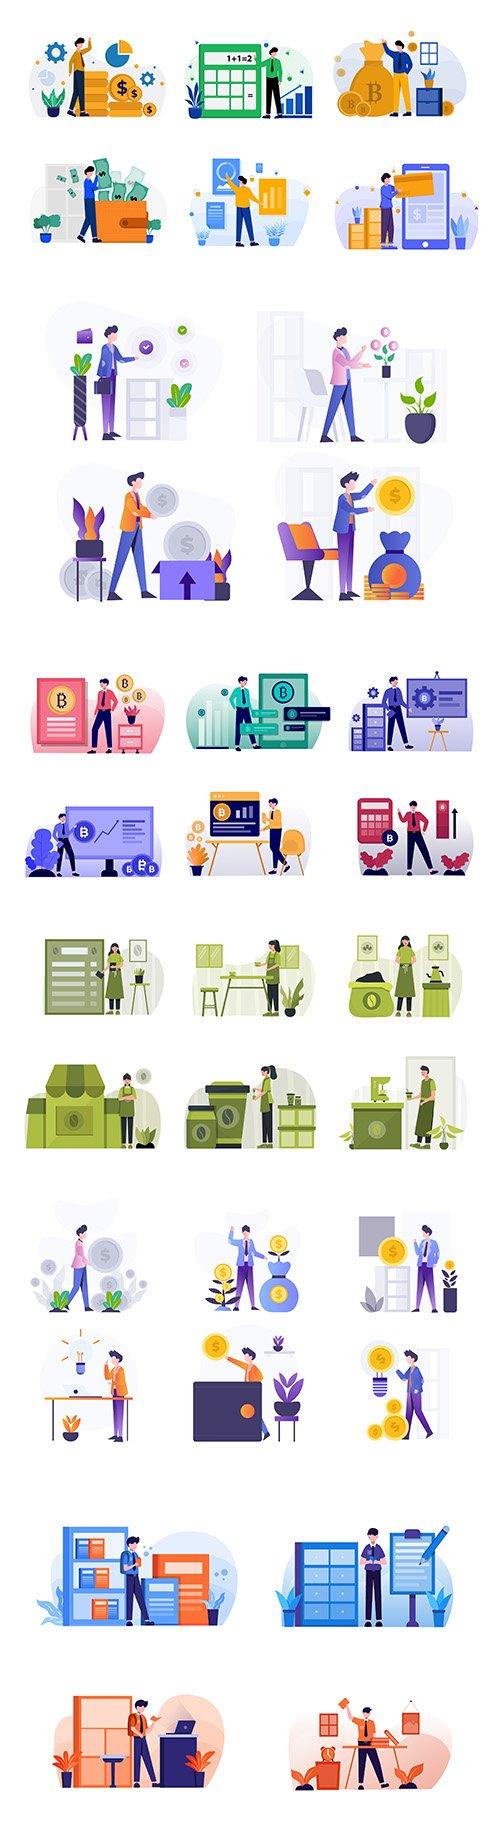 People business investment flat design illustration